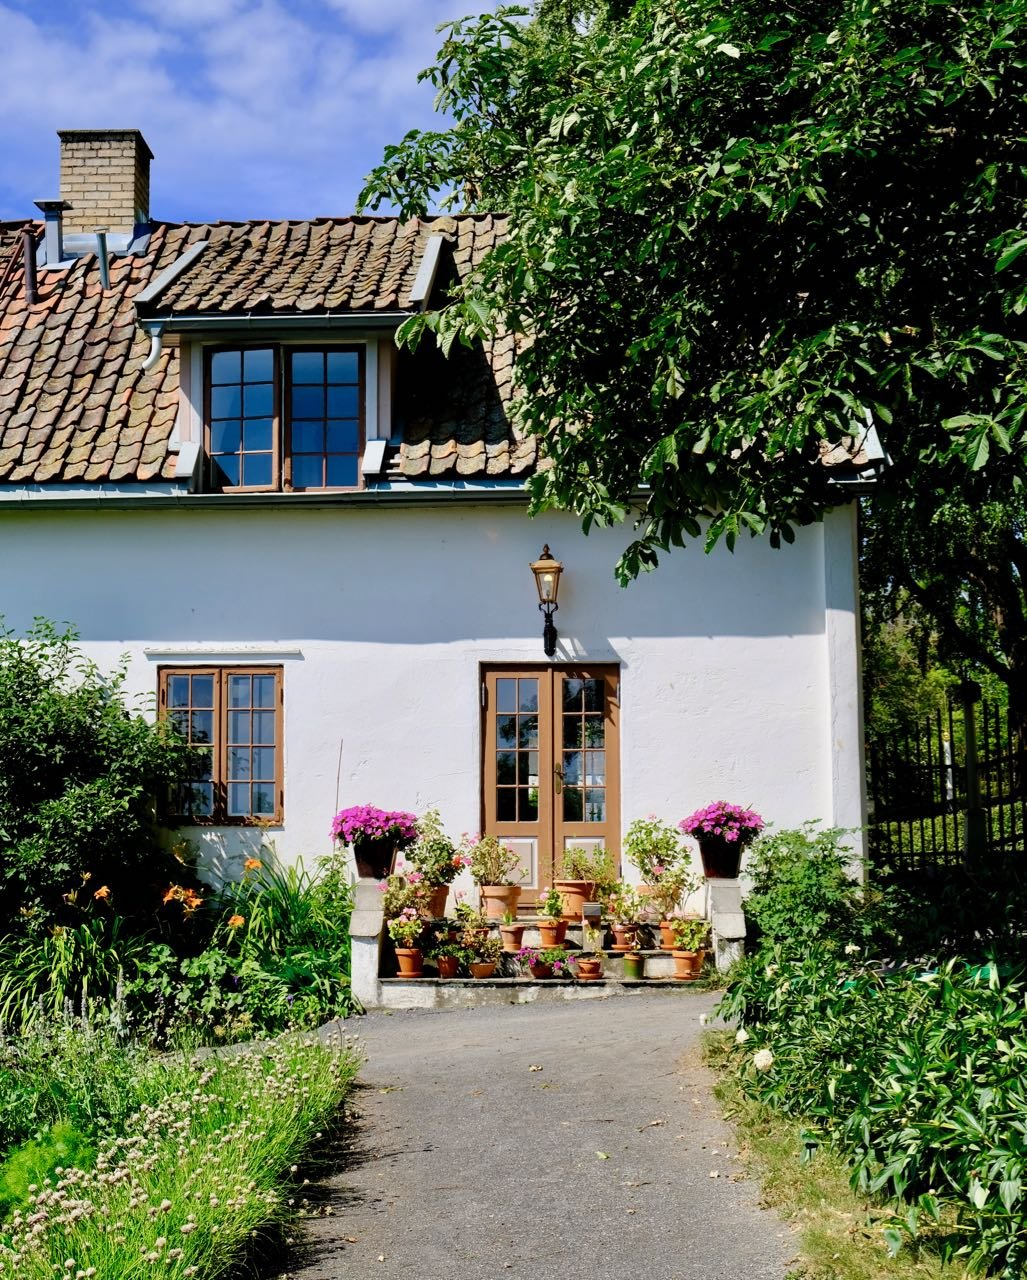 Helgøya Hovelsrud farm historic garden pots flowers review